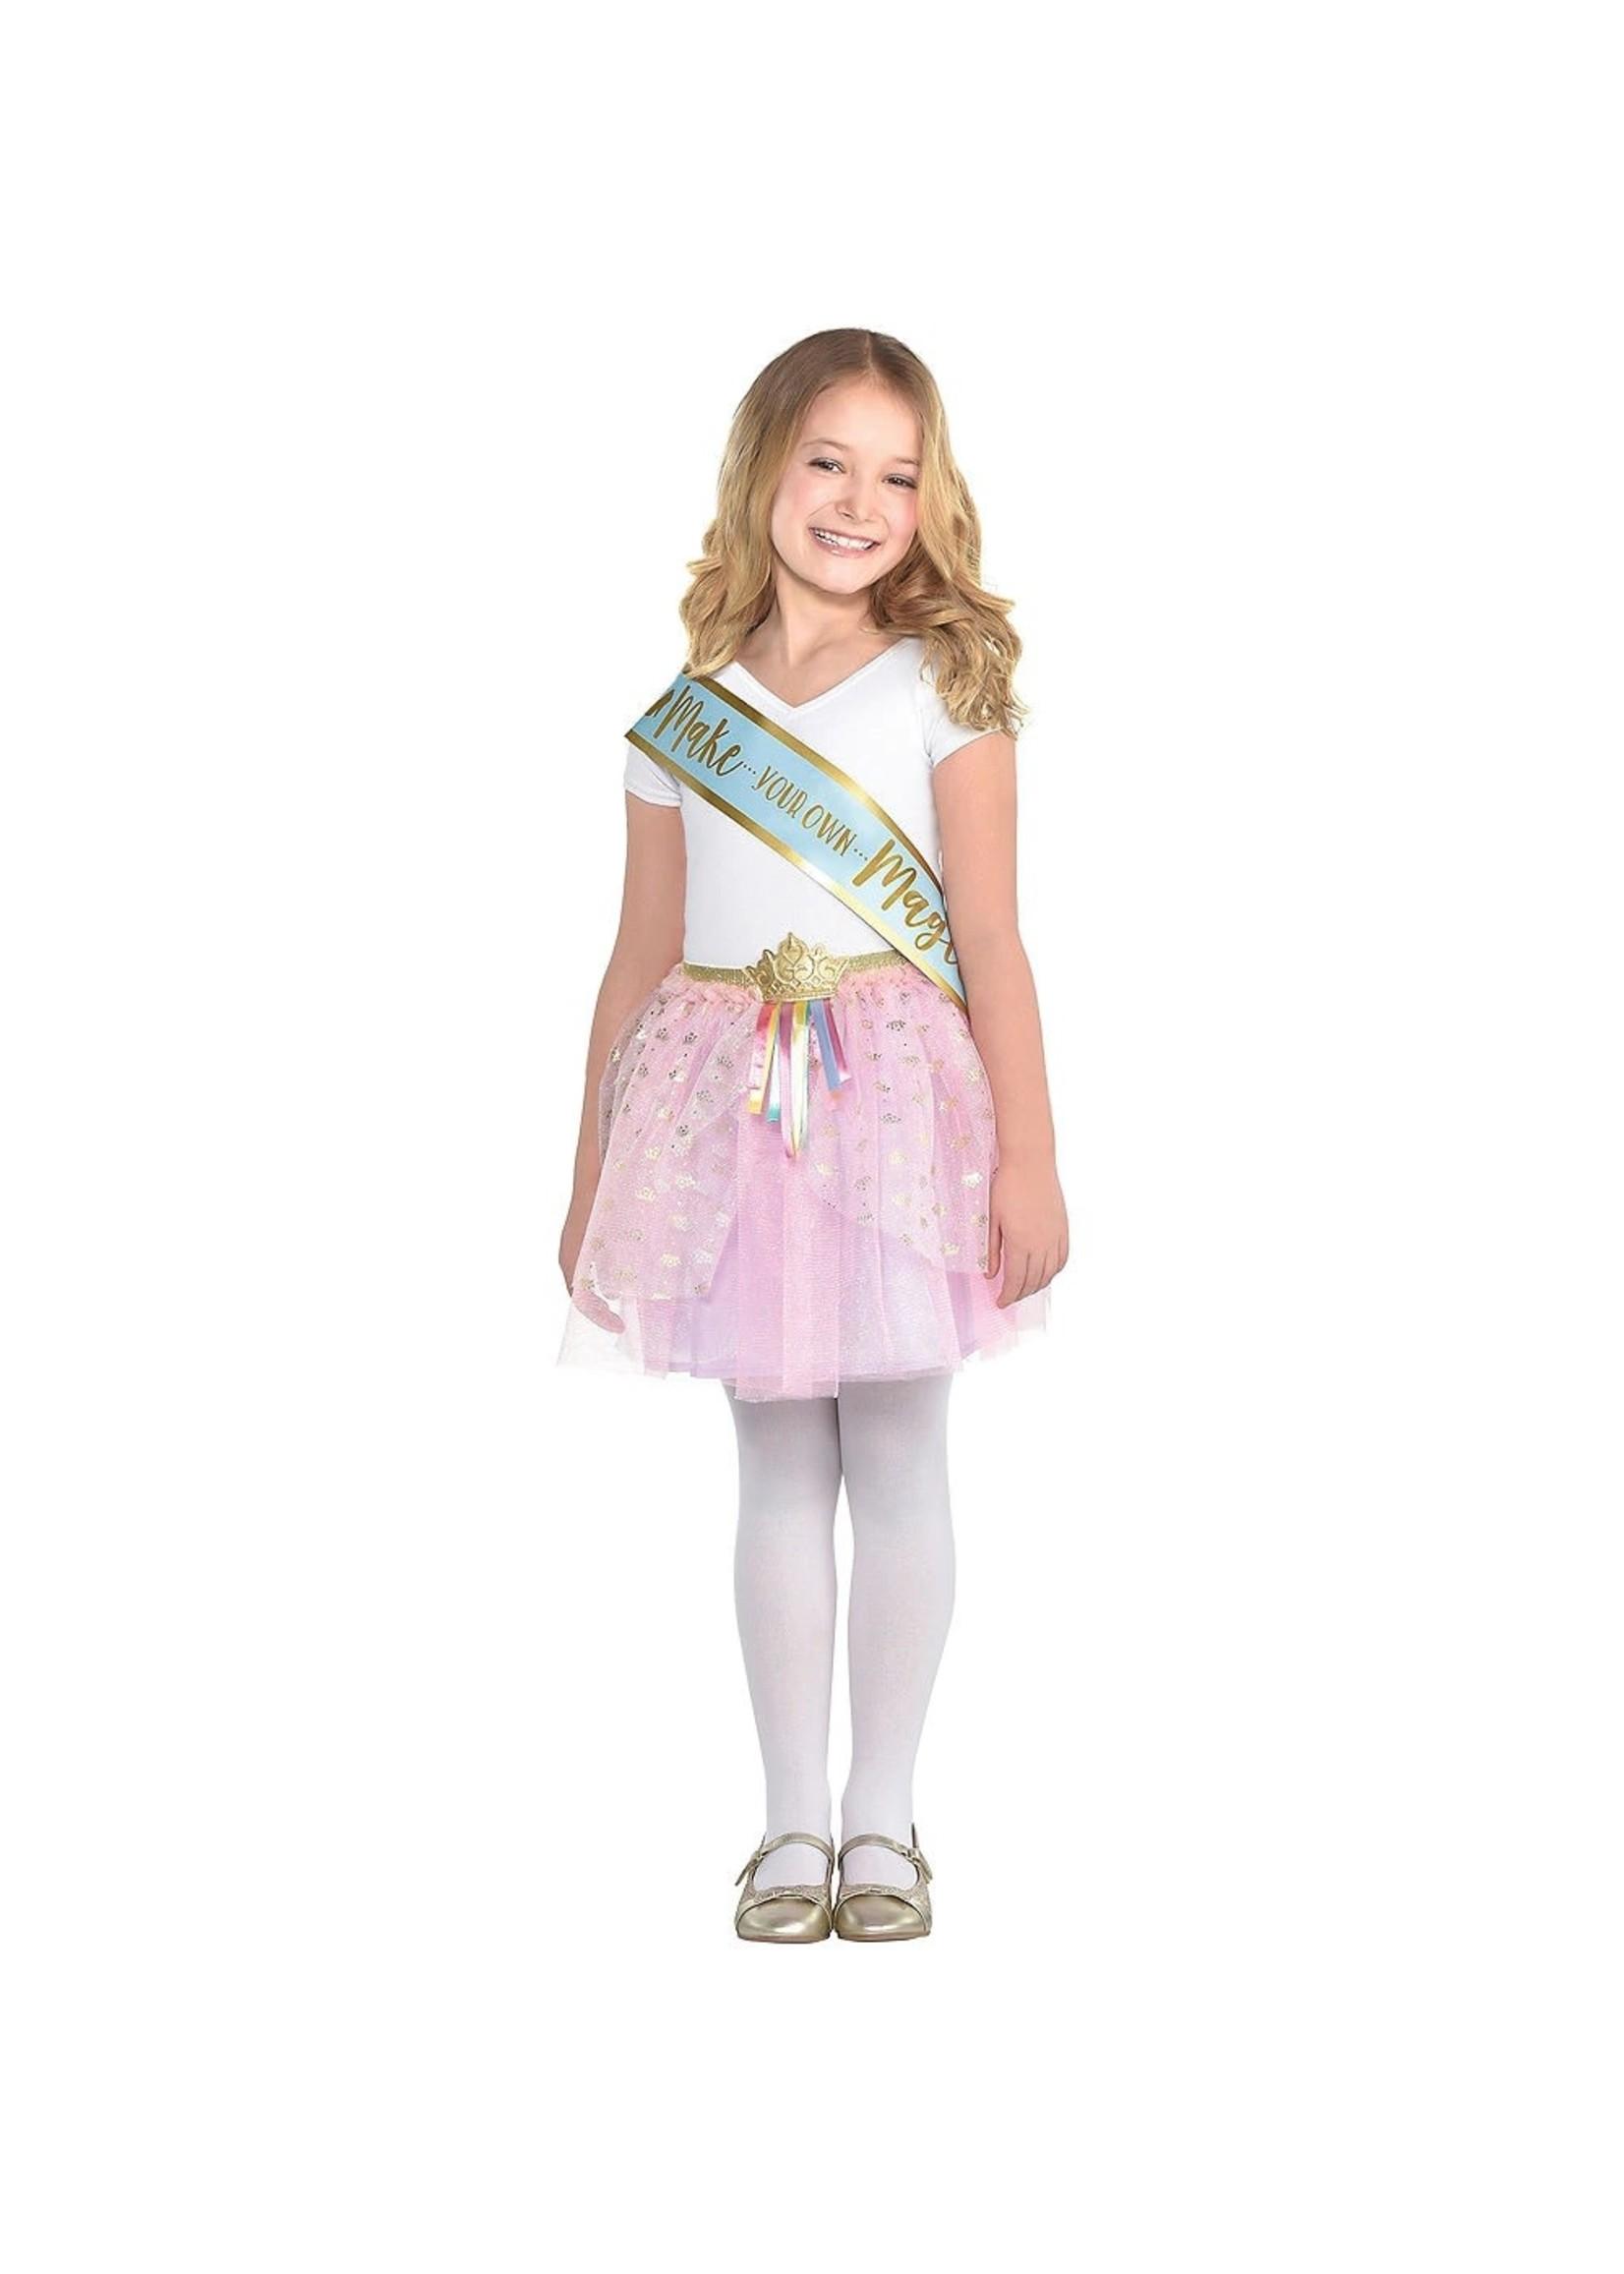 Disney Princess Once Upon a Time Sashes - 8ct